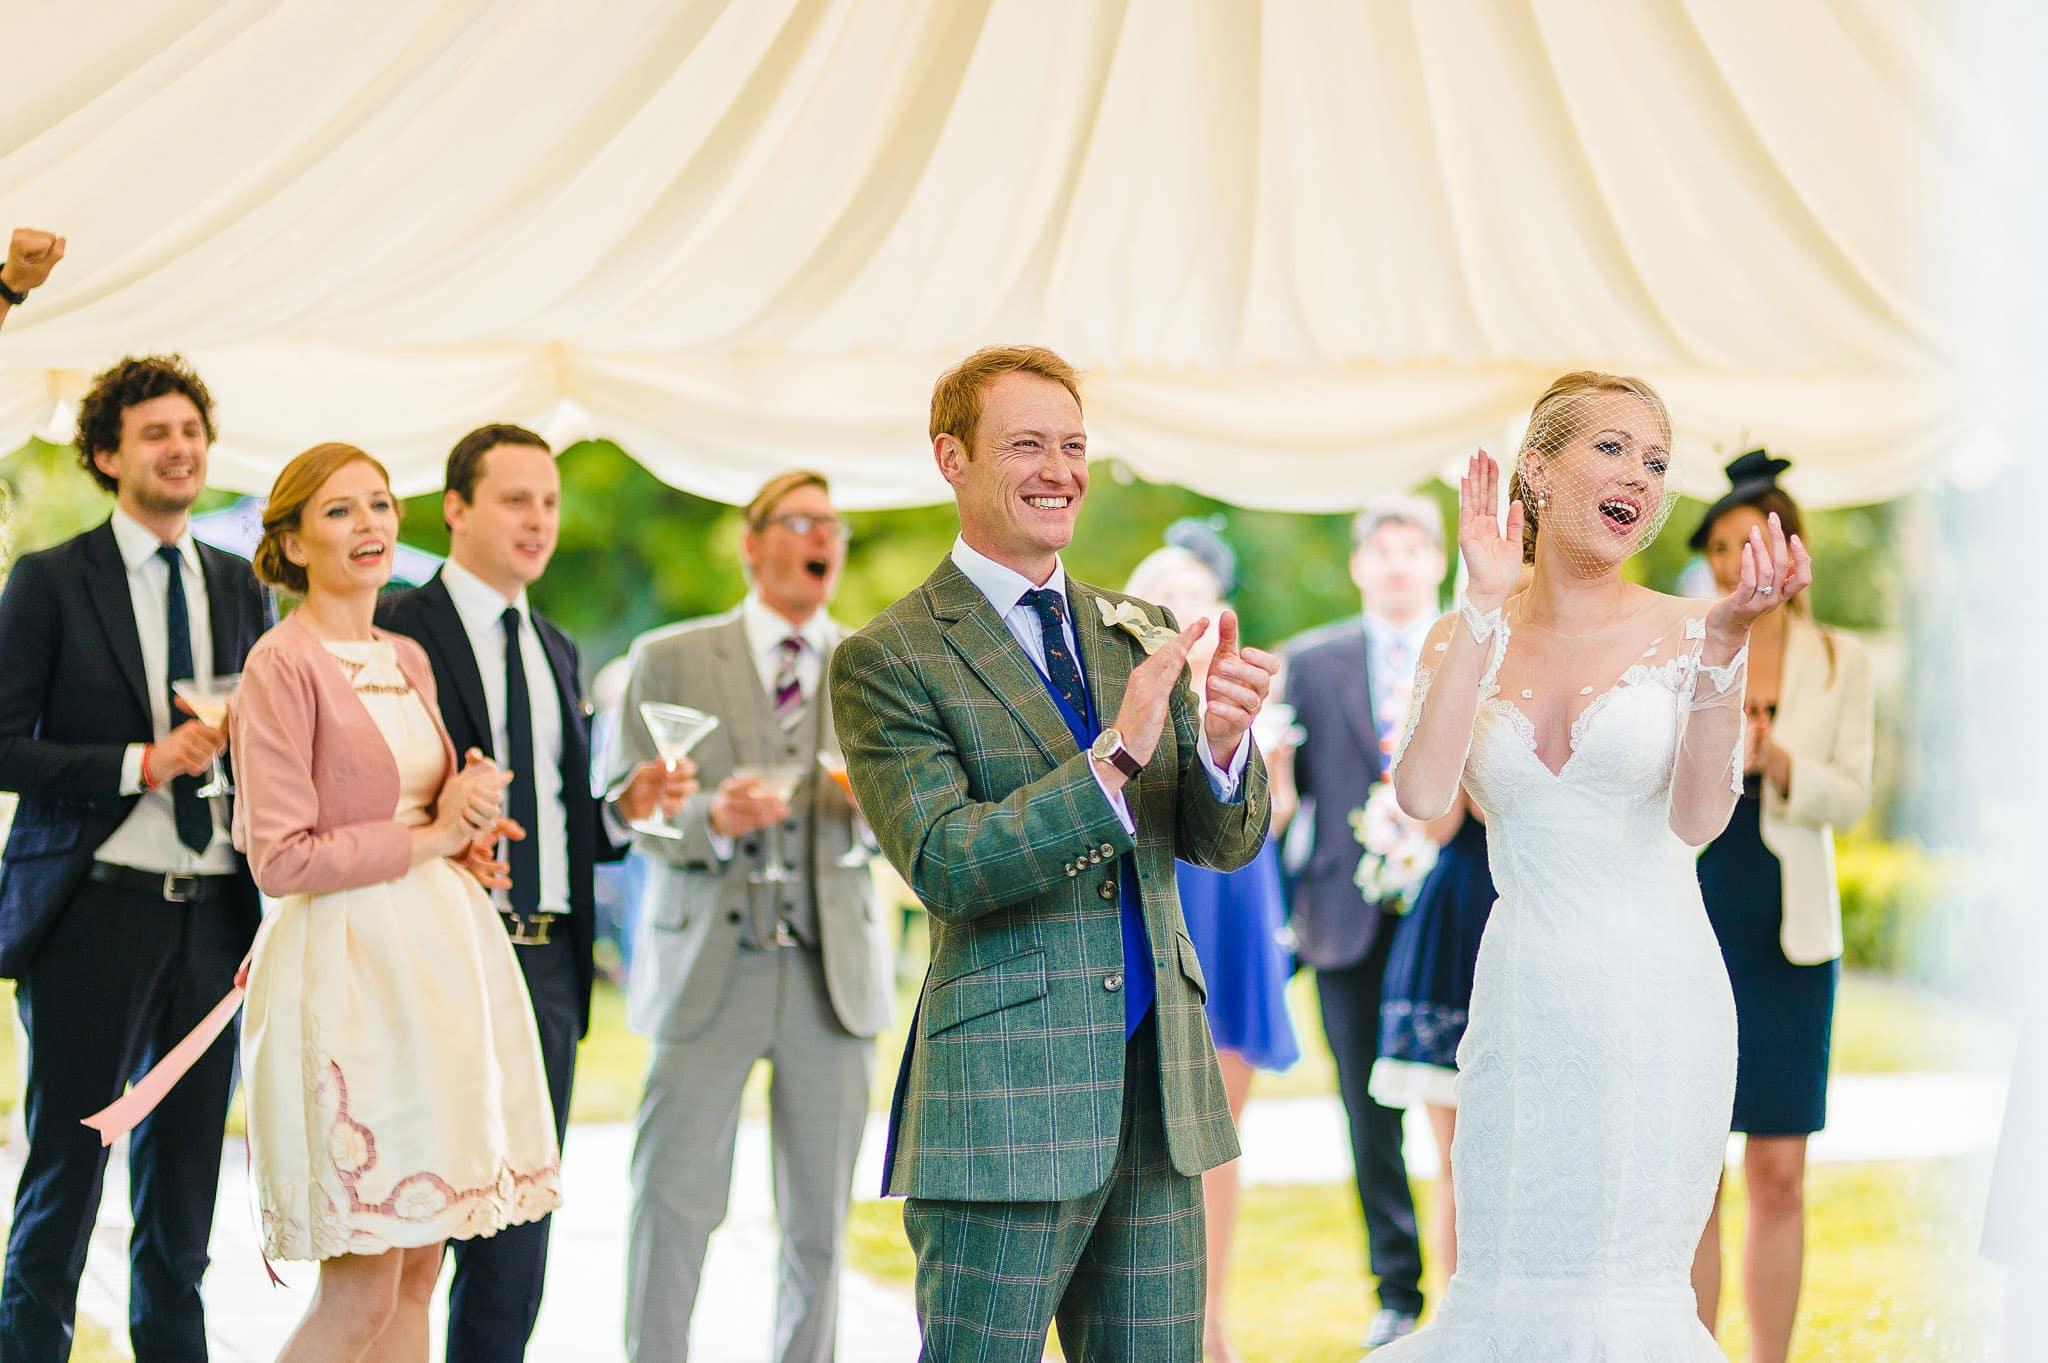 Lemore Manor Wedding Photographer | Hannah and Angus 39